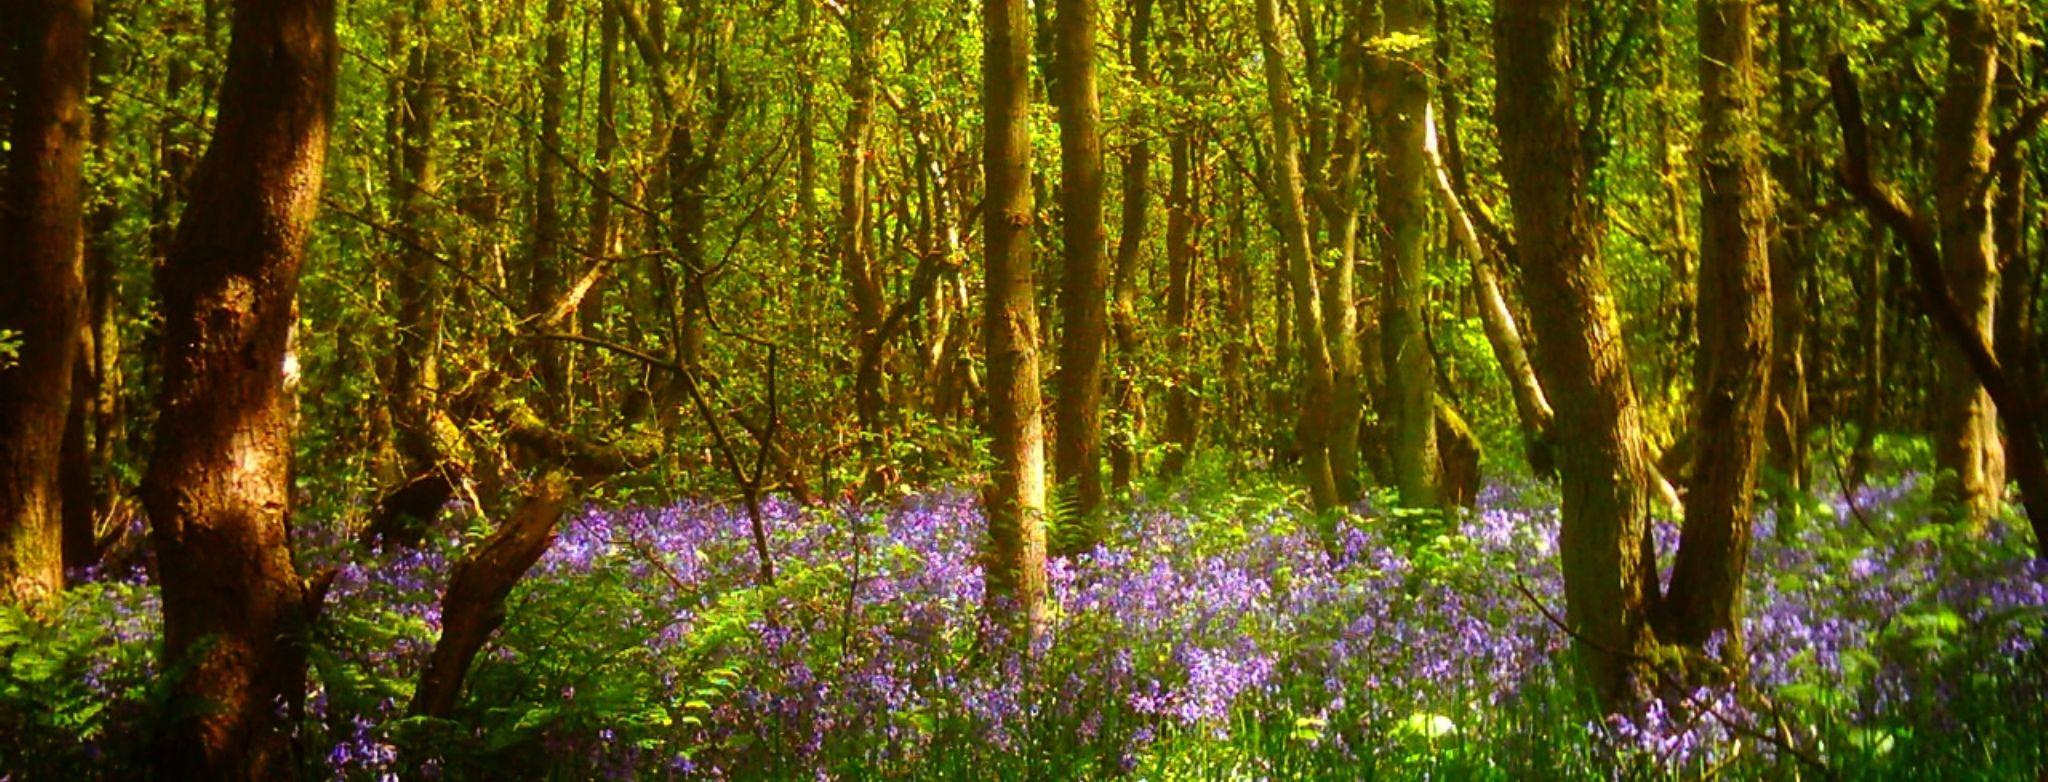 bluebell wood, staffordshire england by chris.adams.3557